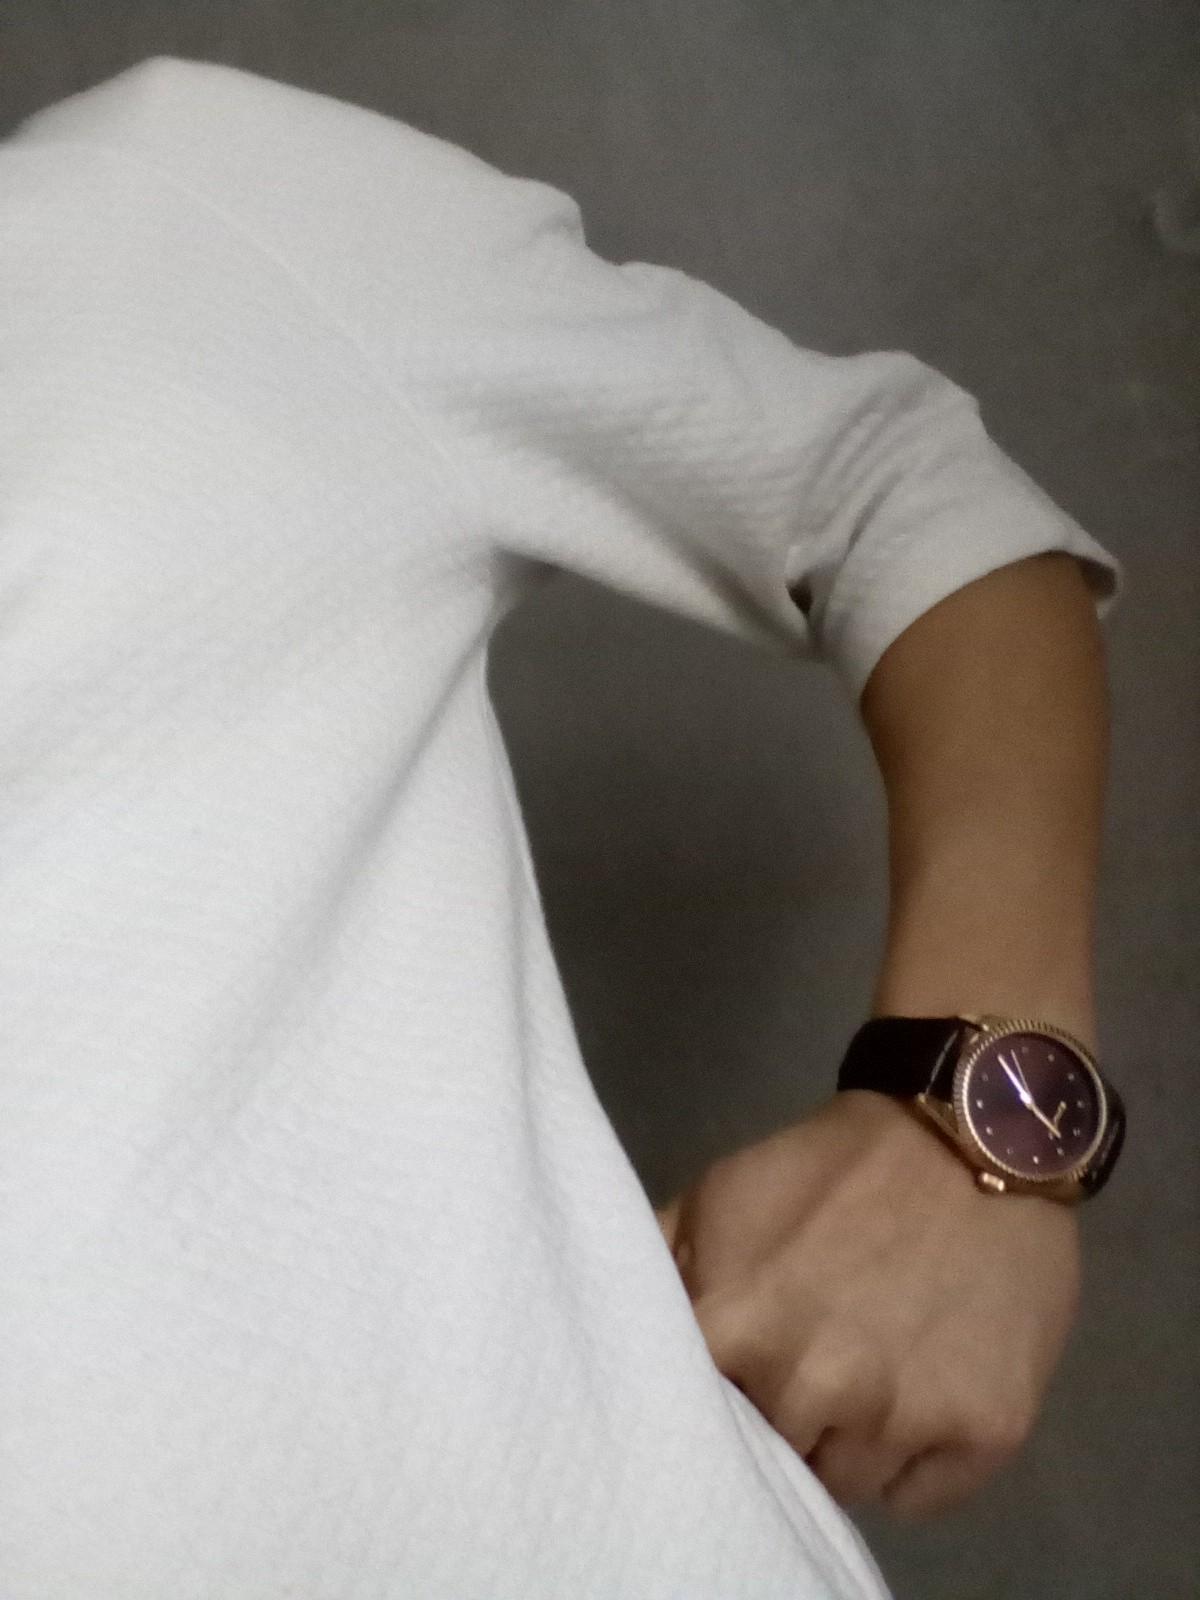 Элегантные наручные часы с натуральным кристаллами